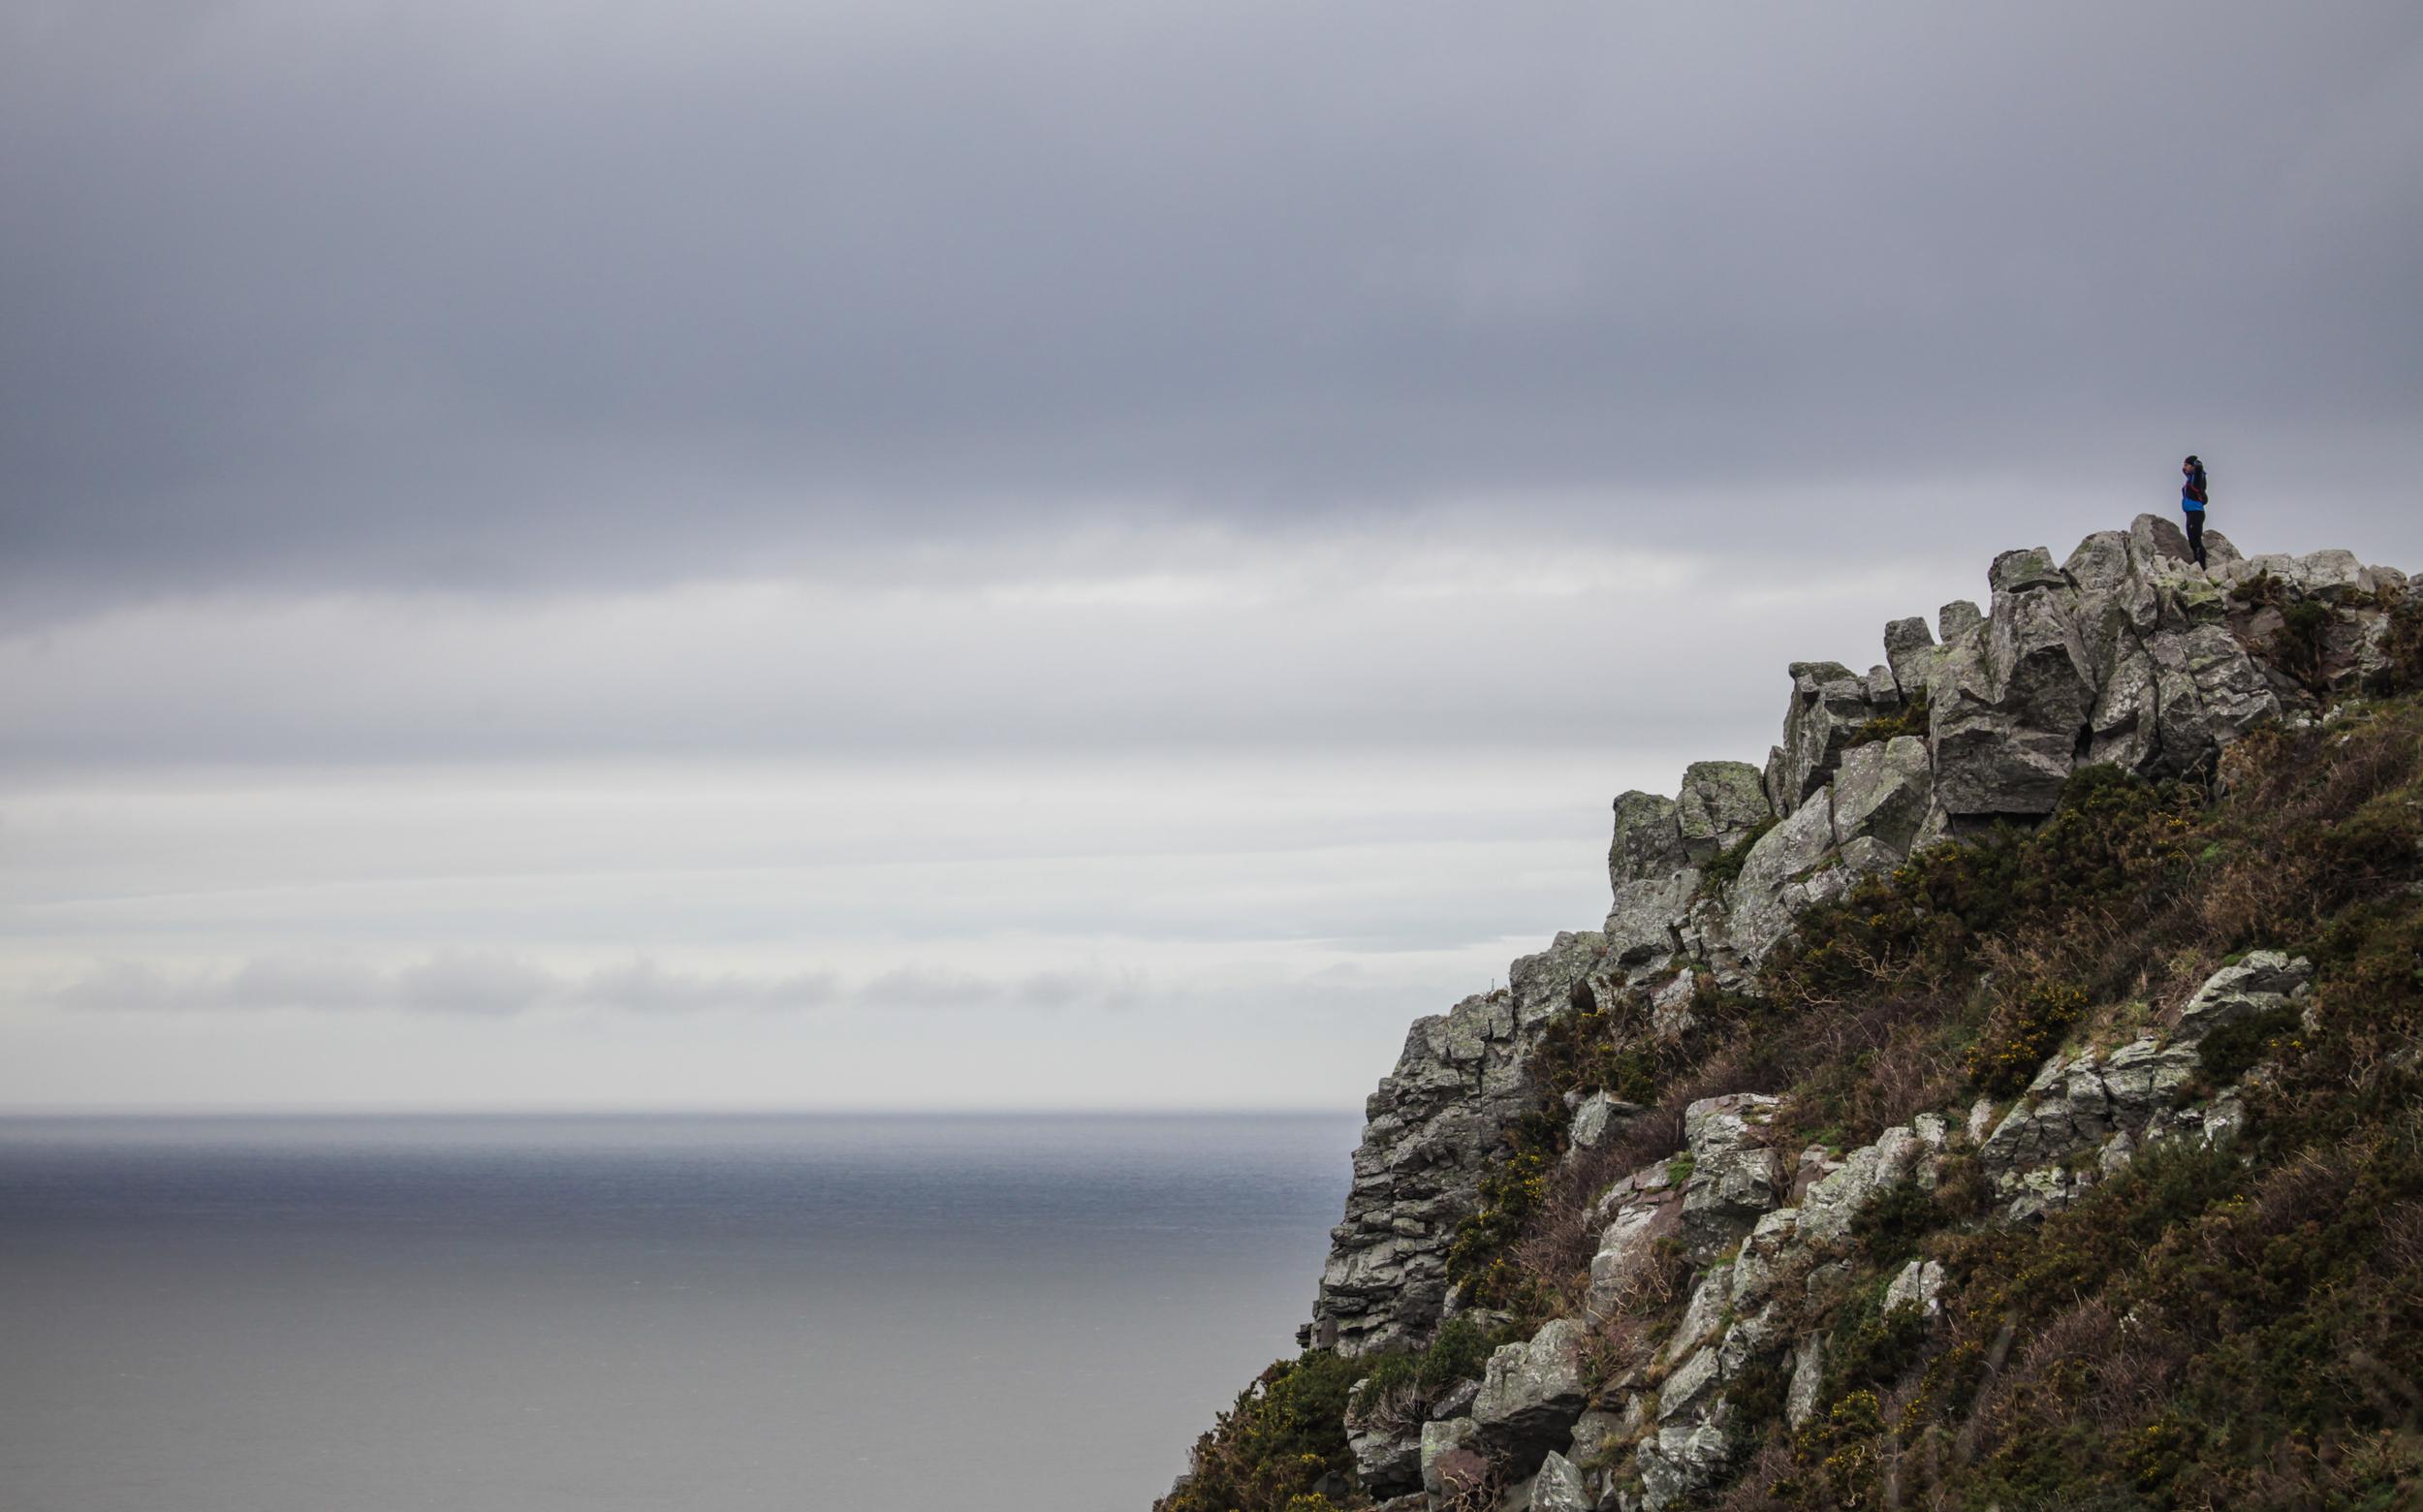 Great British MINI Adventure Day 12 - Exmoor Sea to Summit